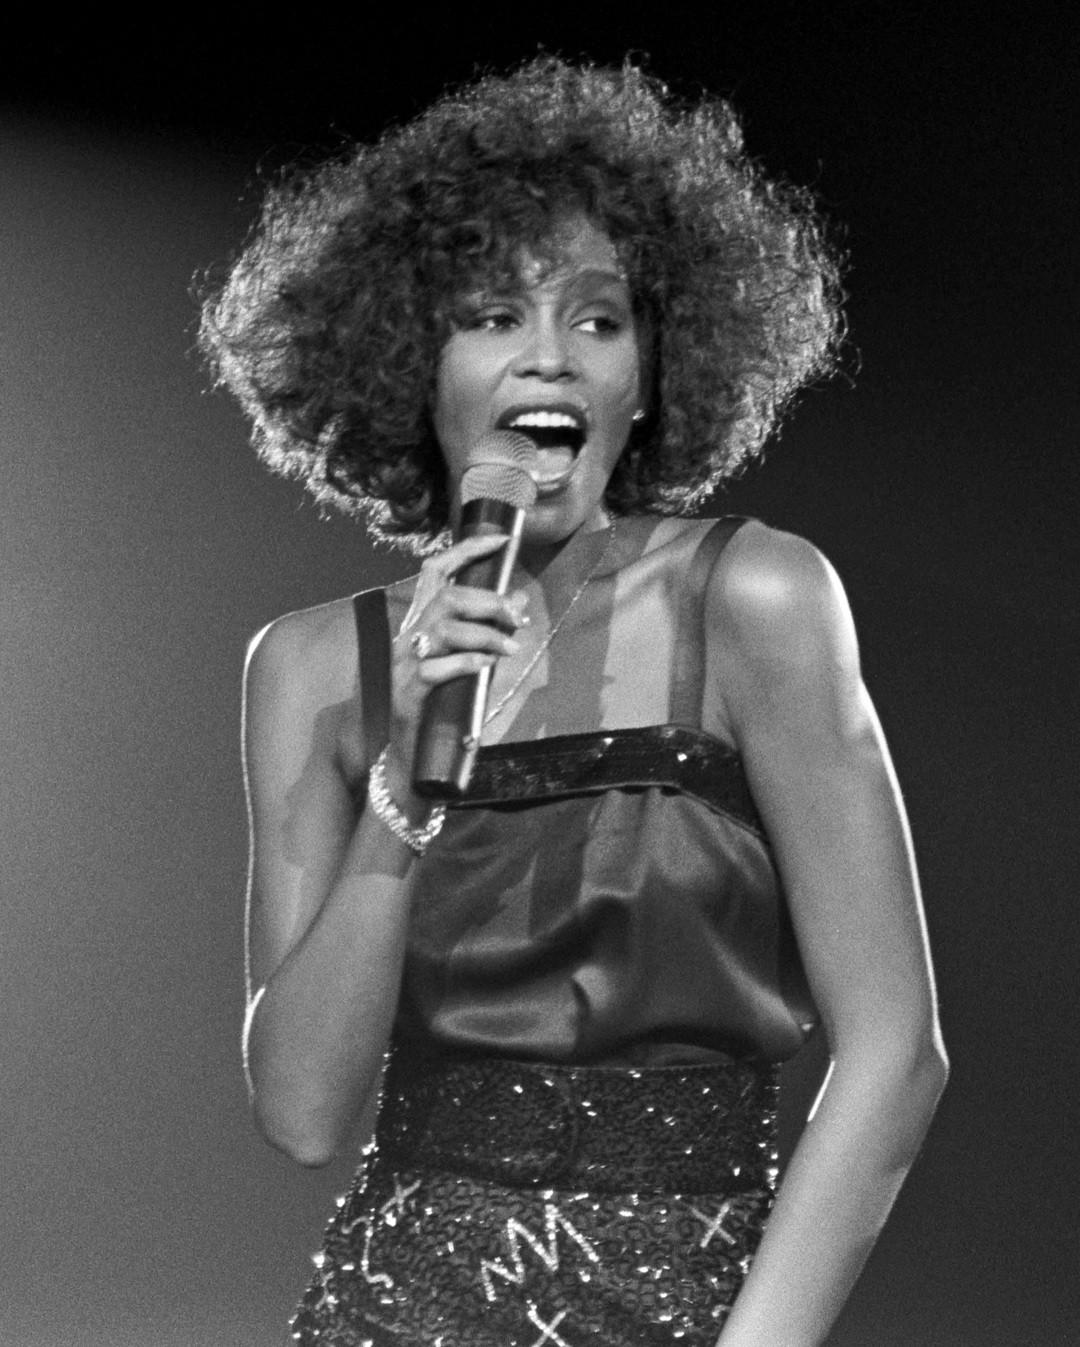 Whitney Houston Kino-Doku - erster Trailer - Bild 1 von 11